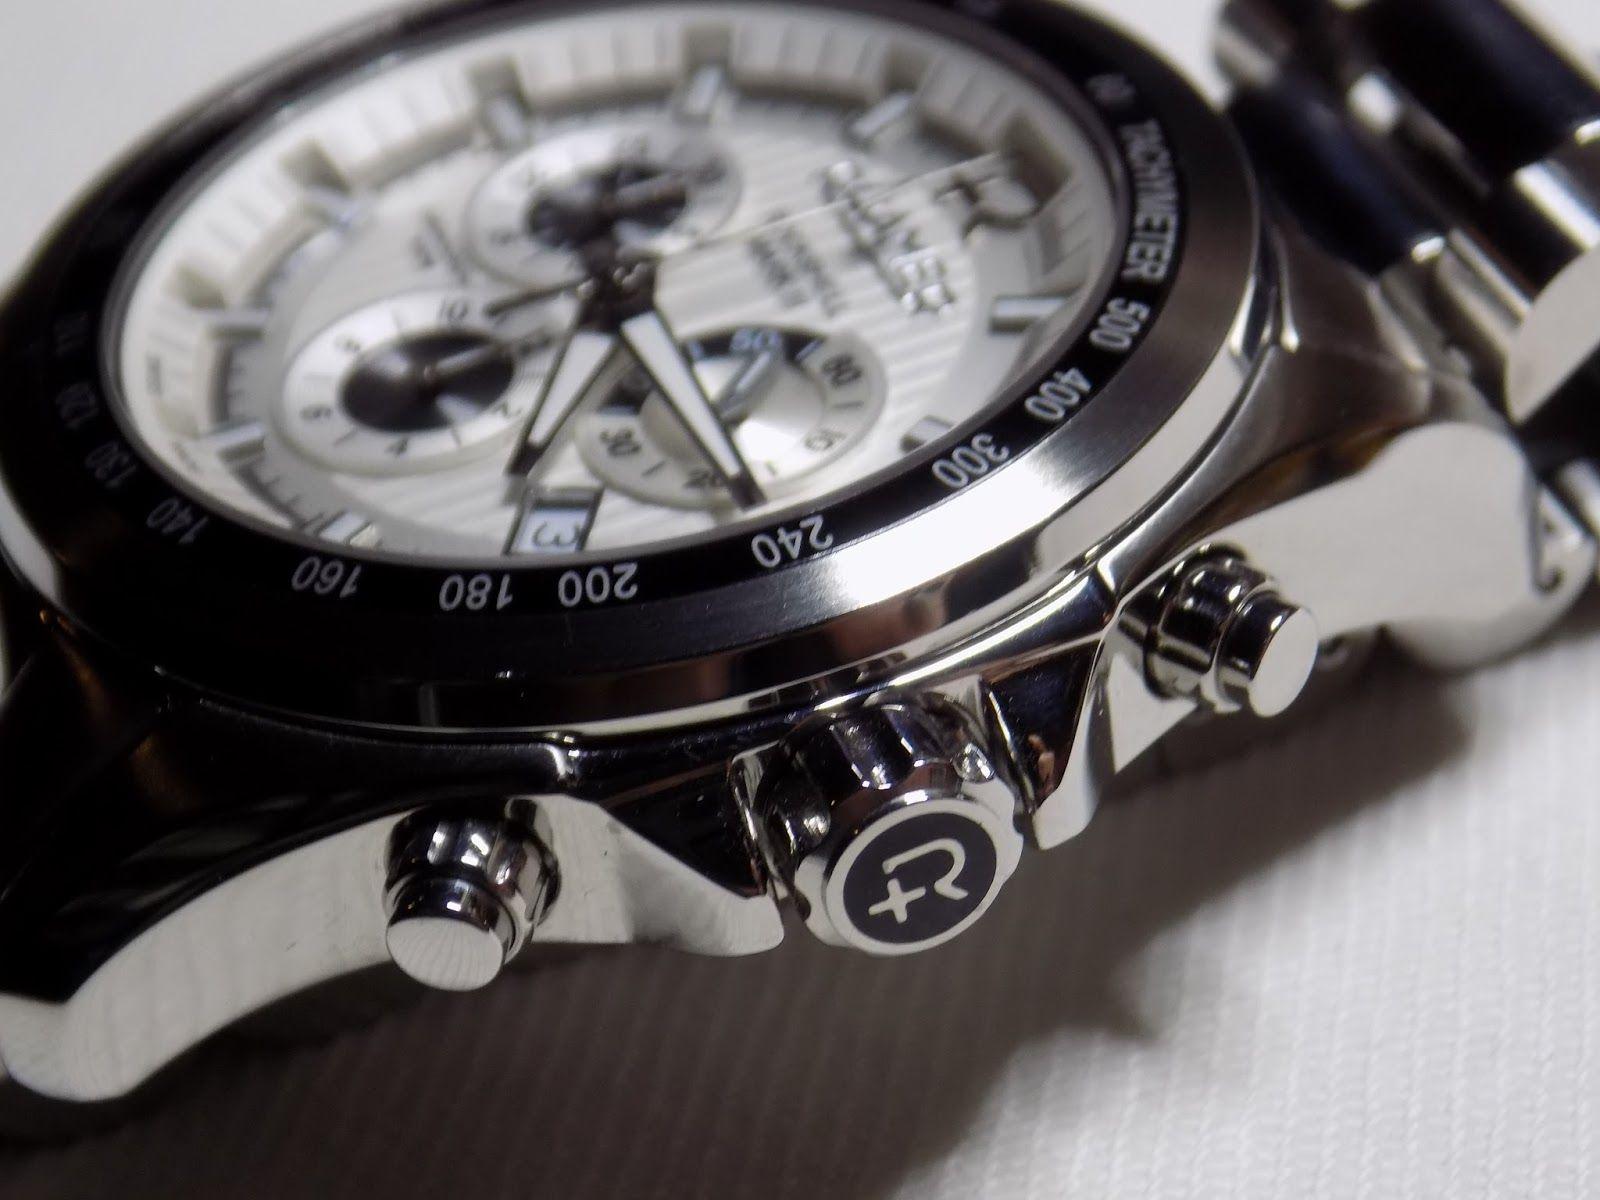 Watch and clock collection roamer rockshell mark iii chrono